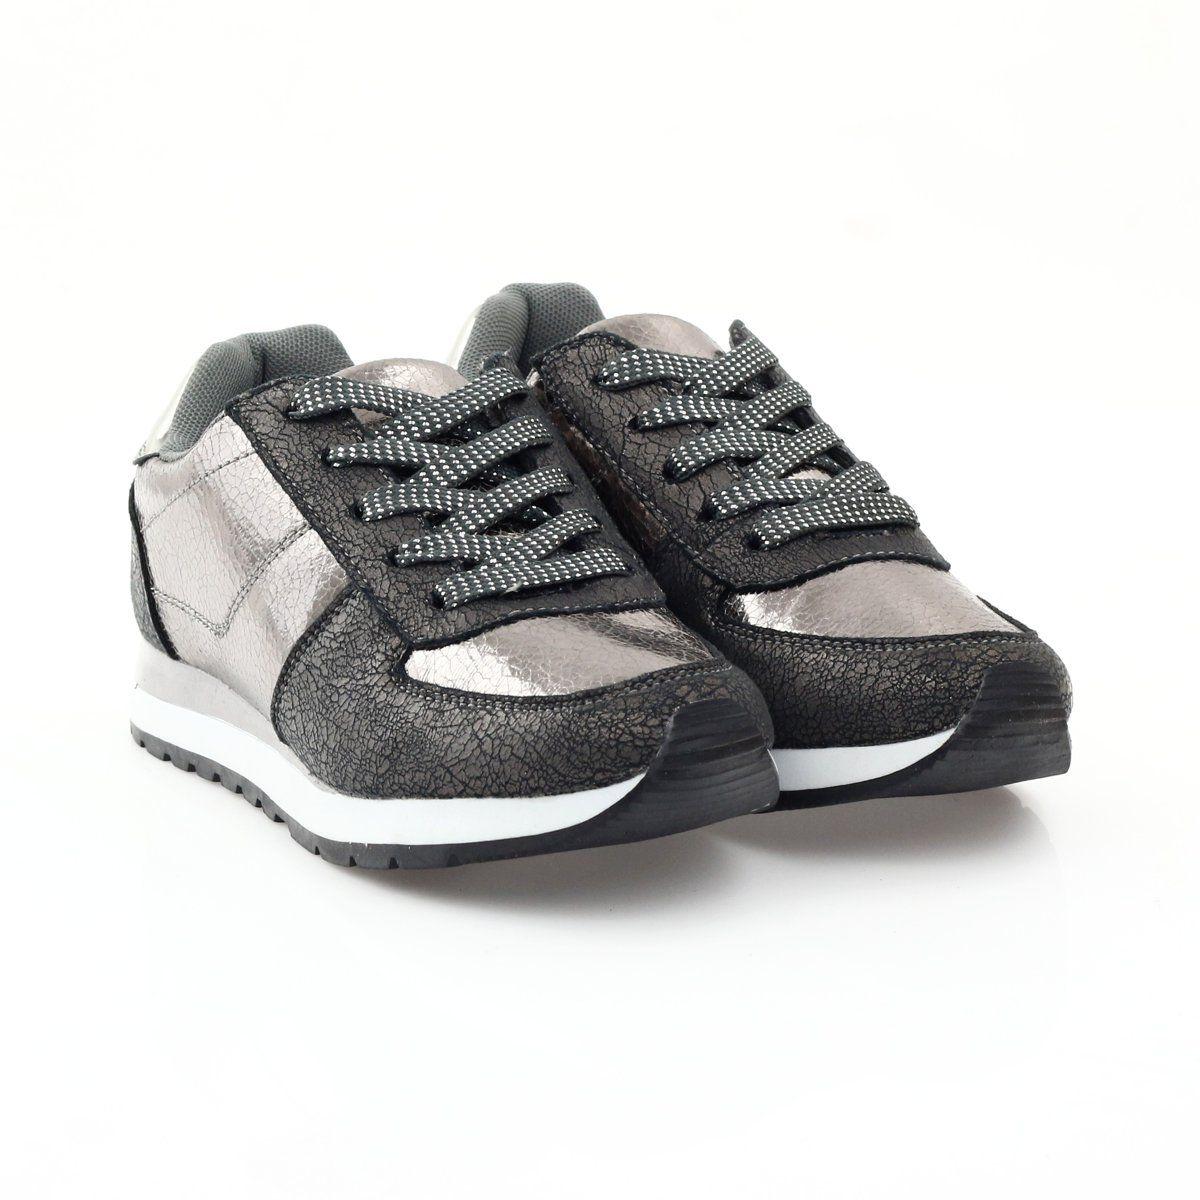 Mcarthur Copper Sports Shoes Grey